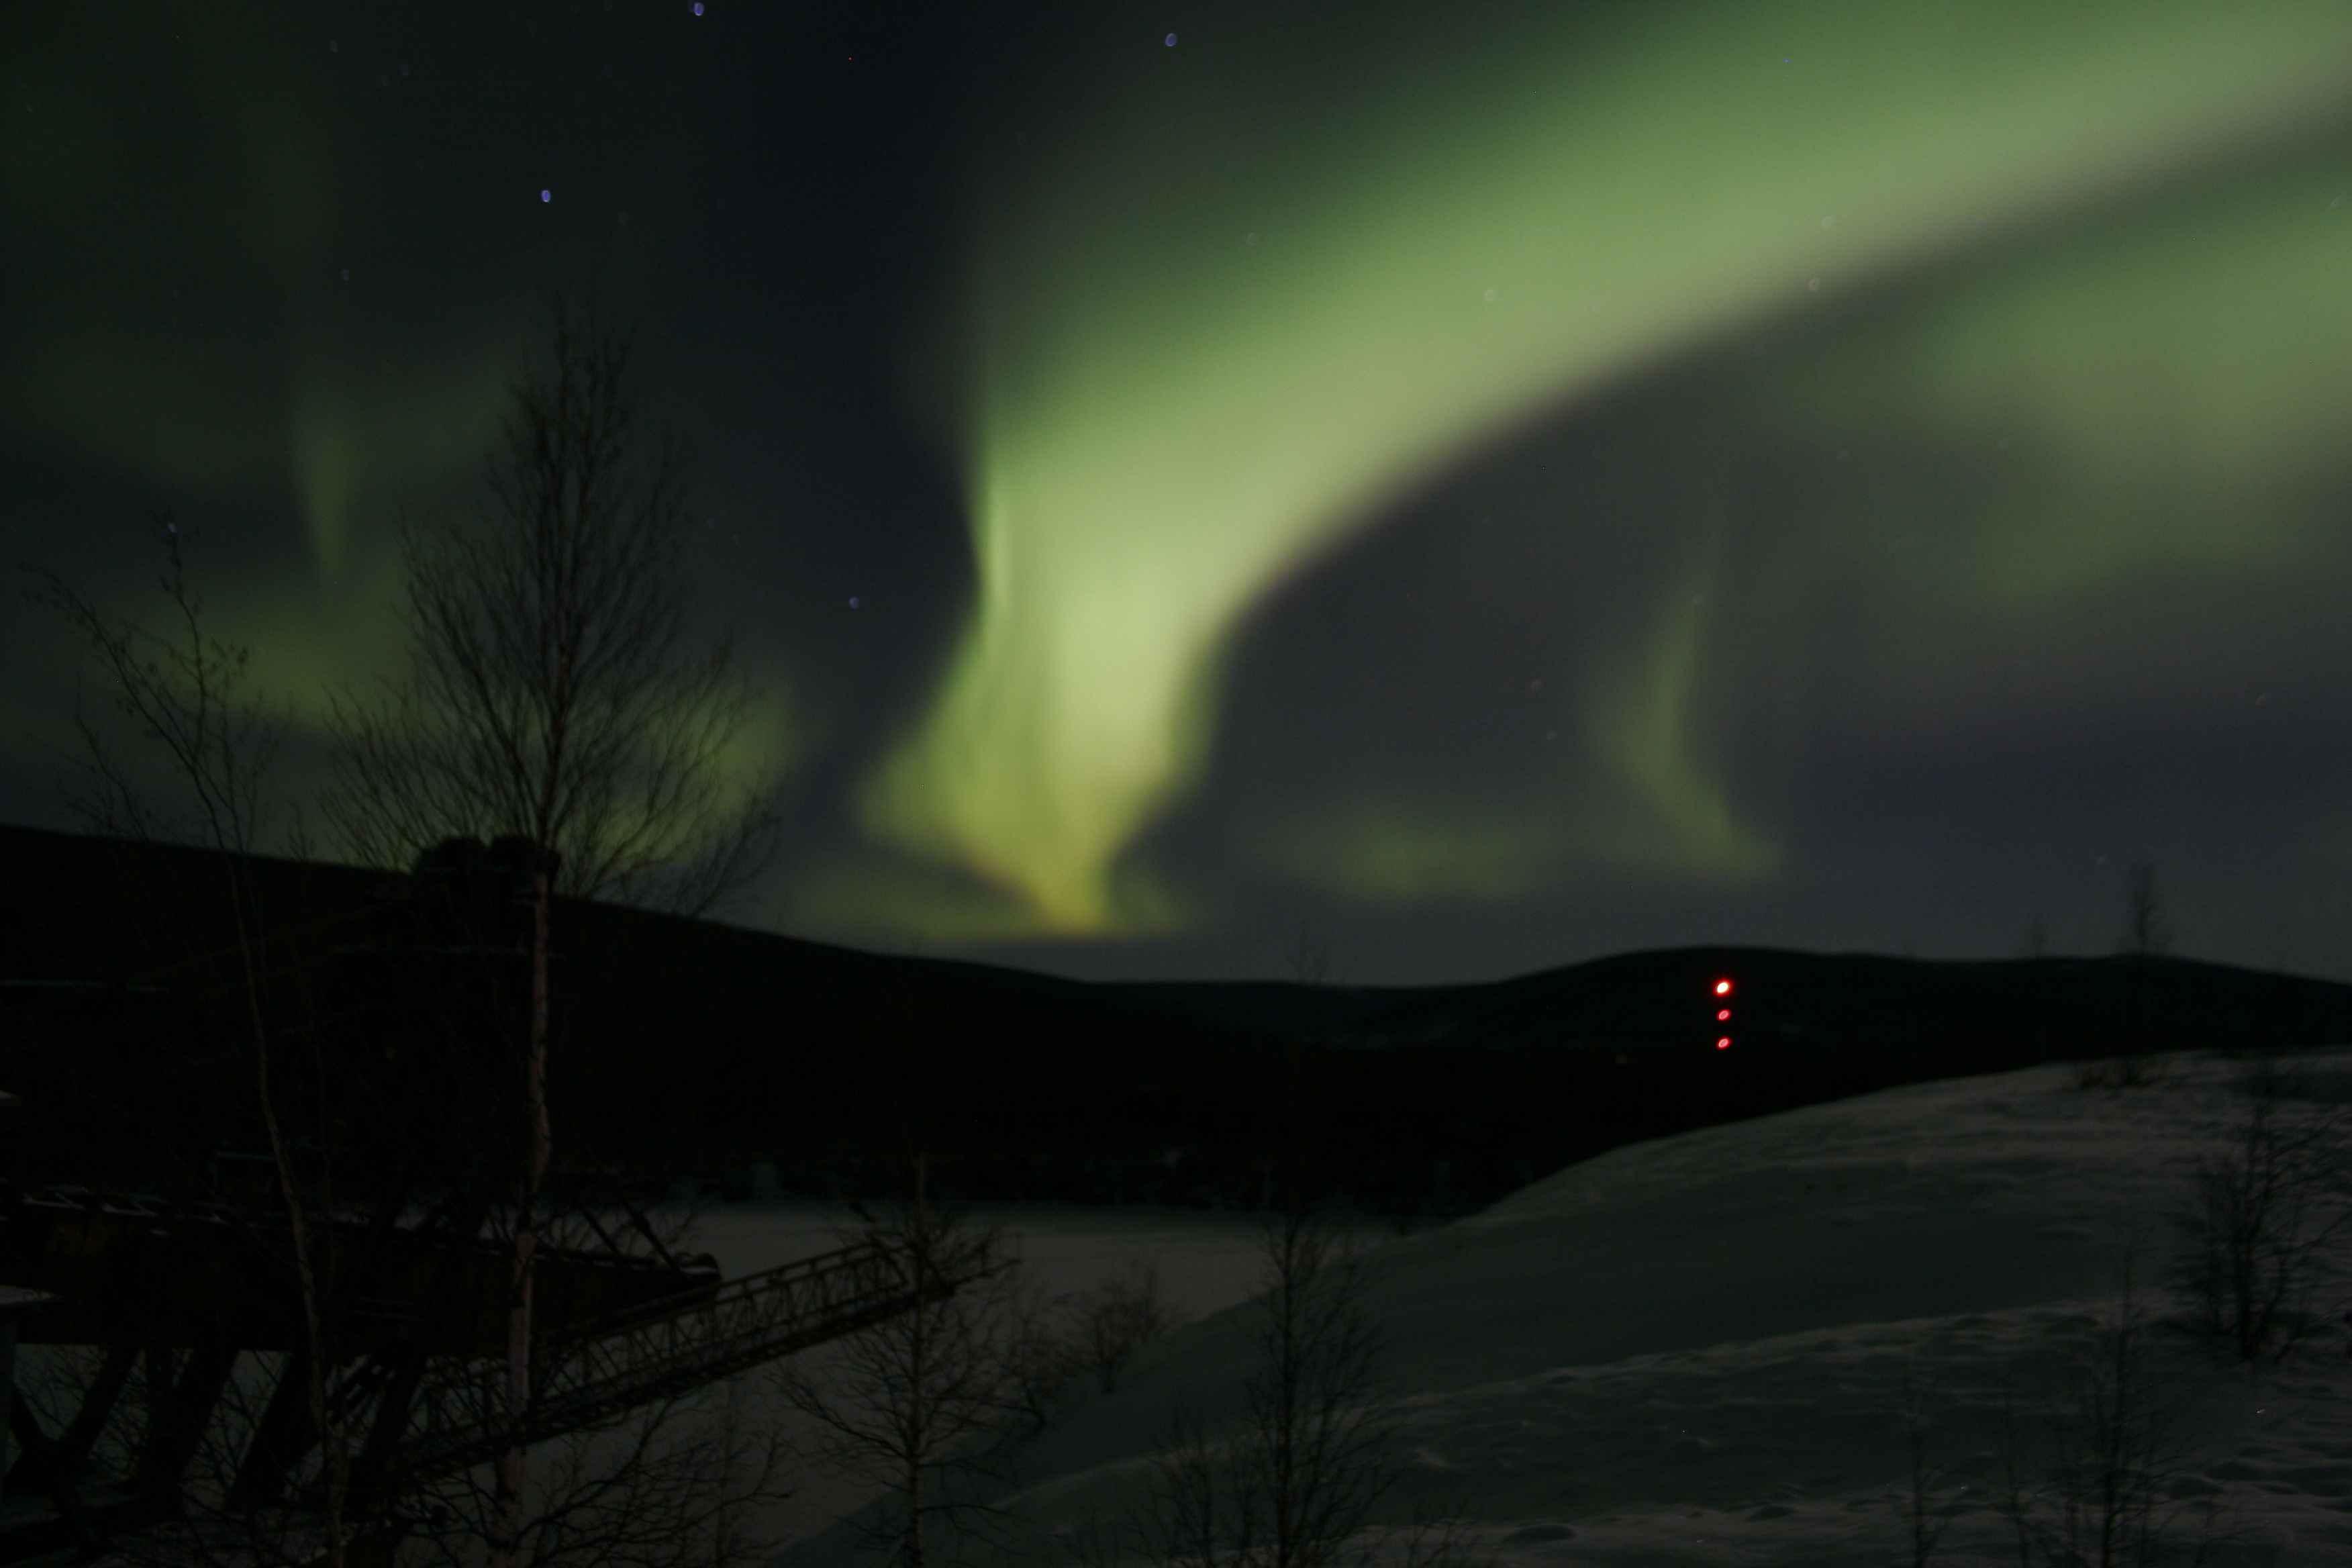 Fall Winter Wallpaper Free Free Picture Northern Lights Alaska Aurora Borealis